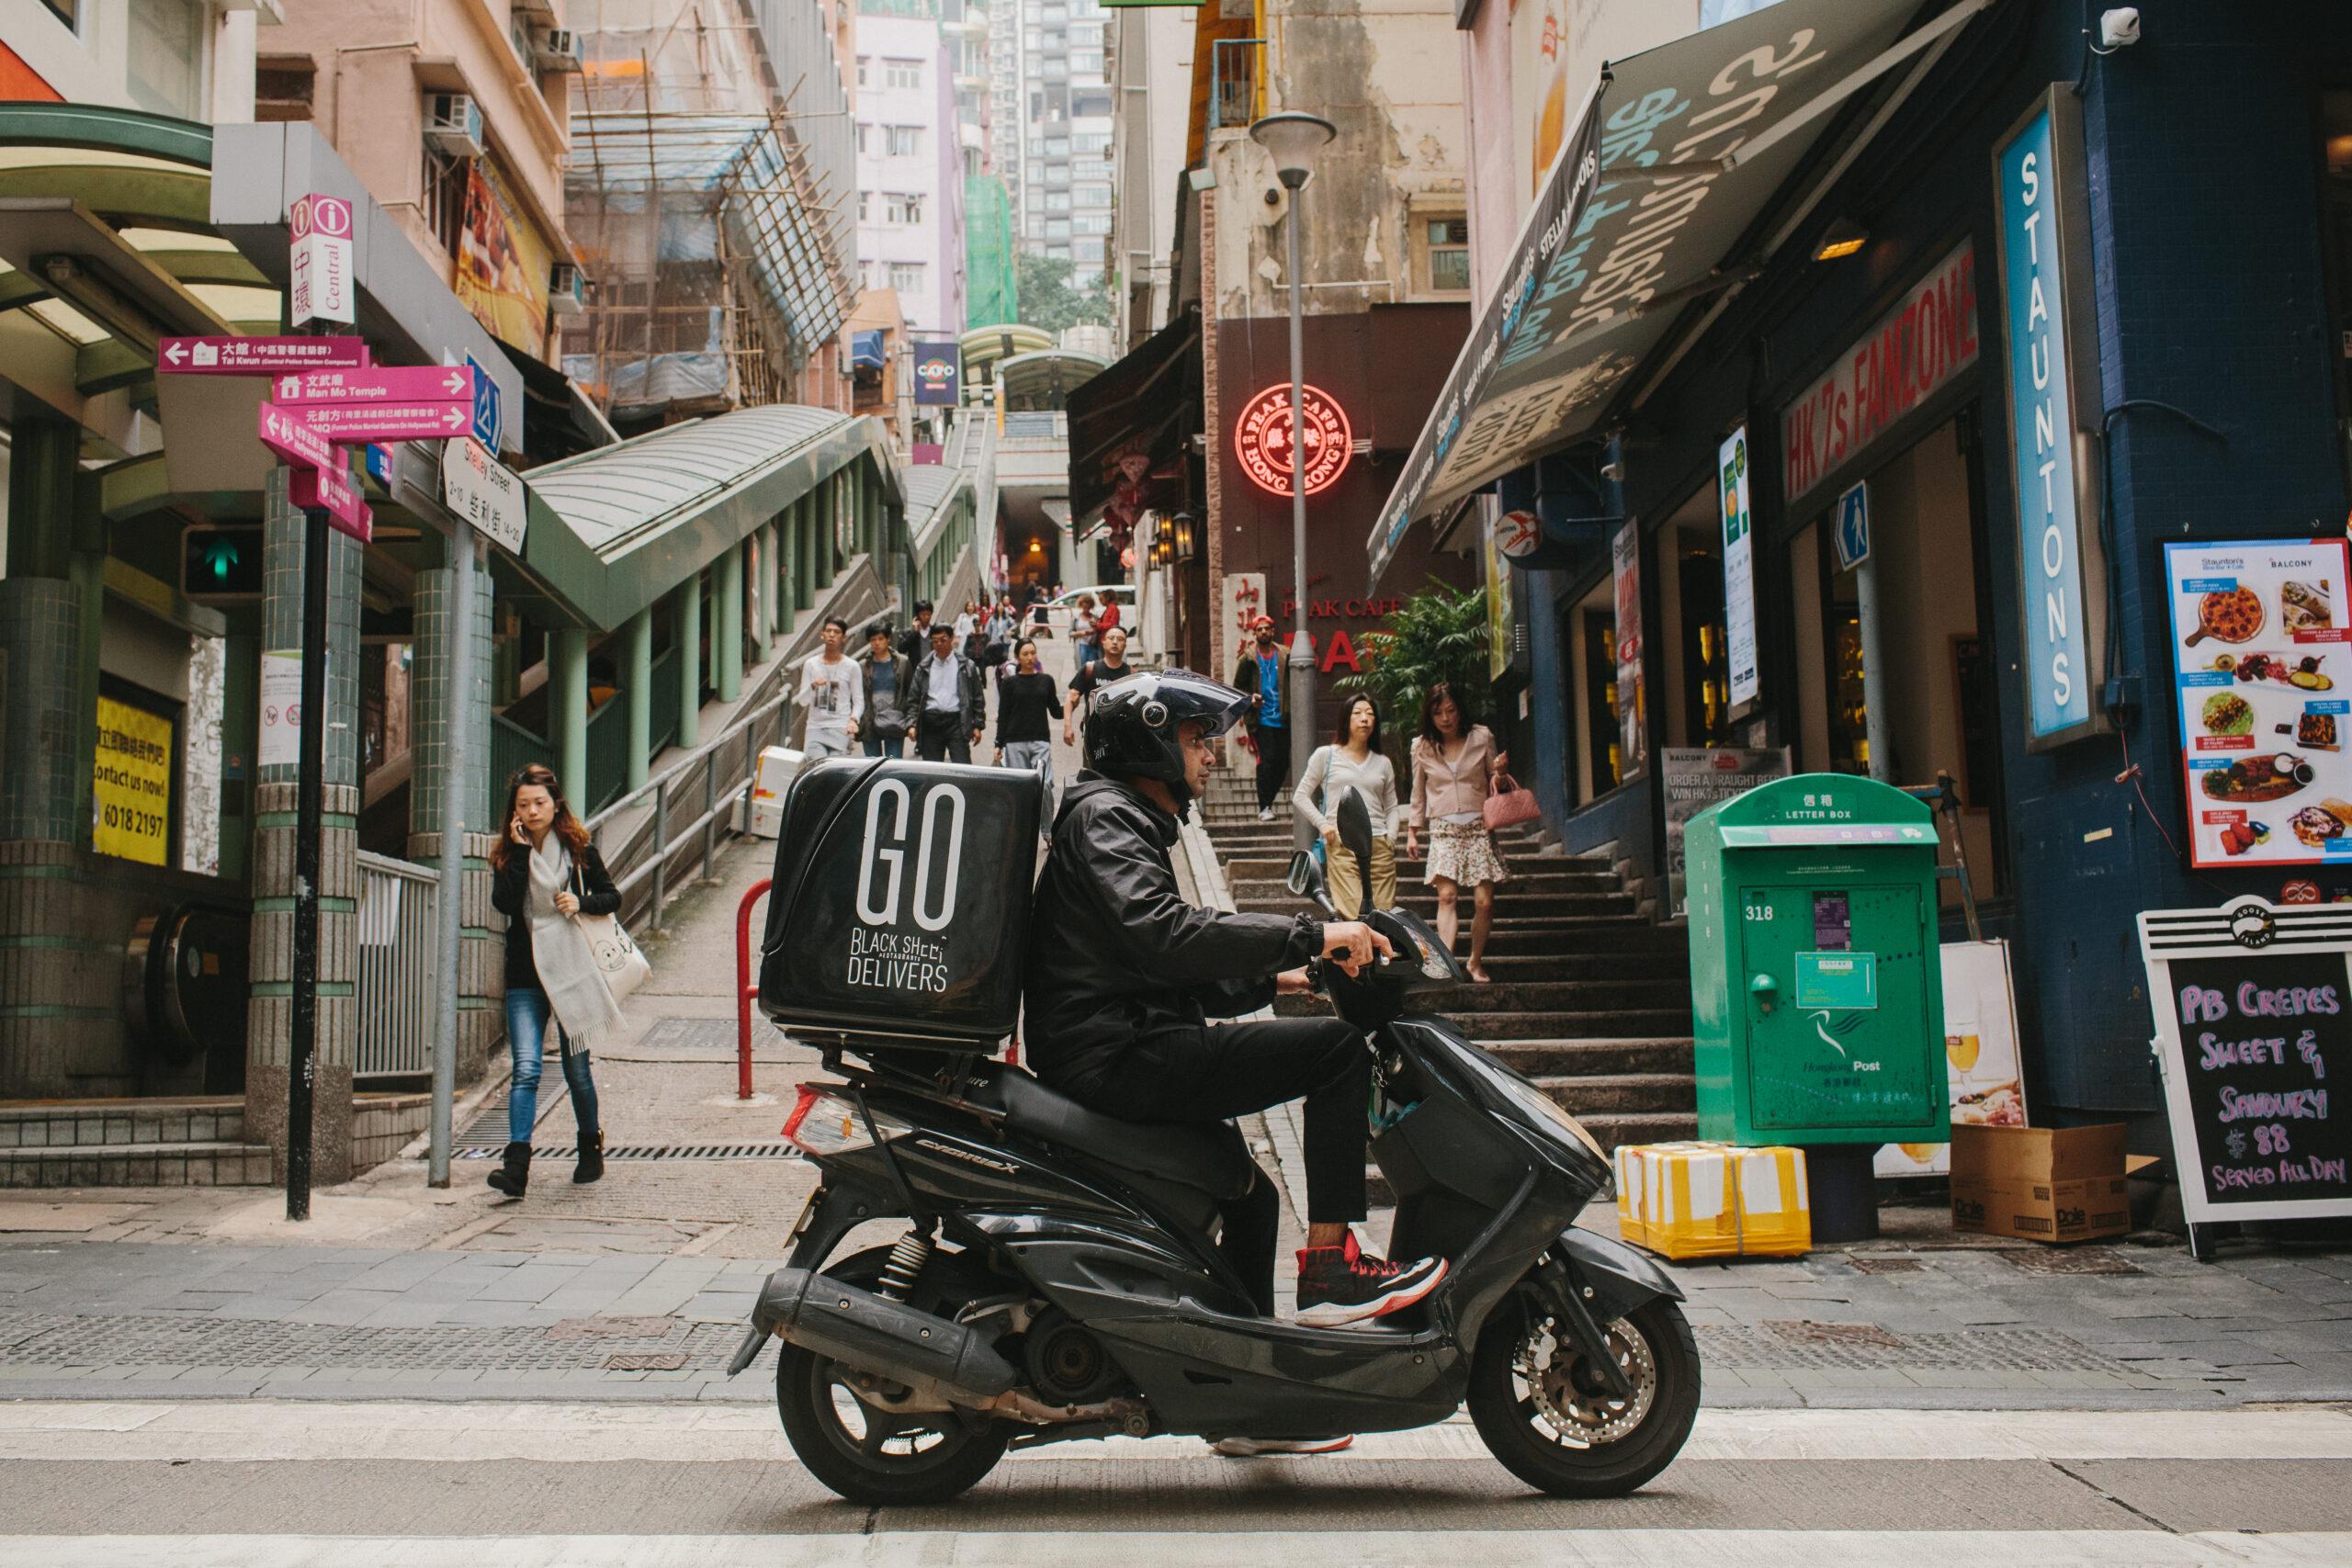 The Loop HK 30 Best Eats 2020 Best Takeaway / Delivery: Black Sheep Restaurants GO